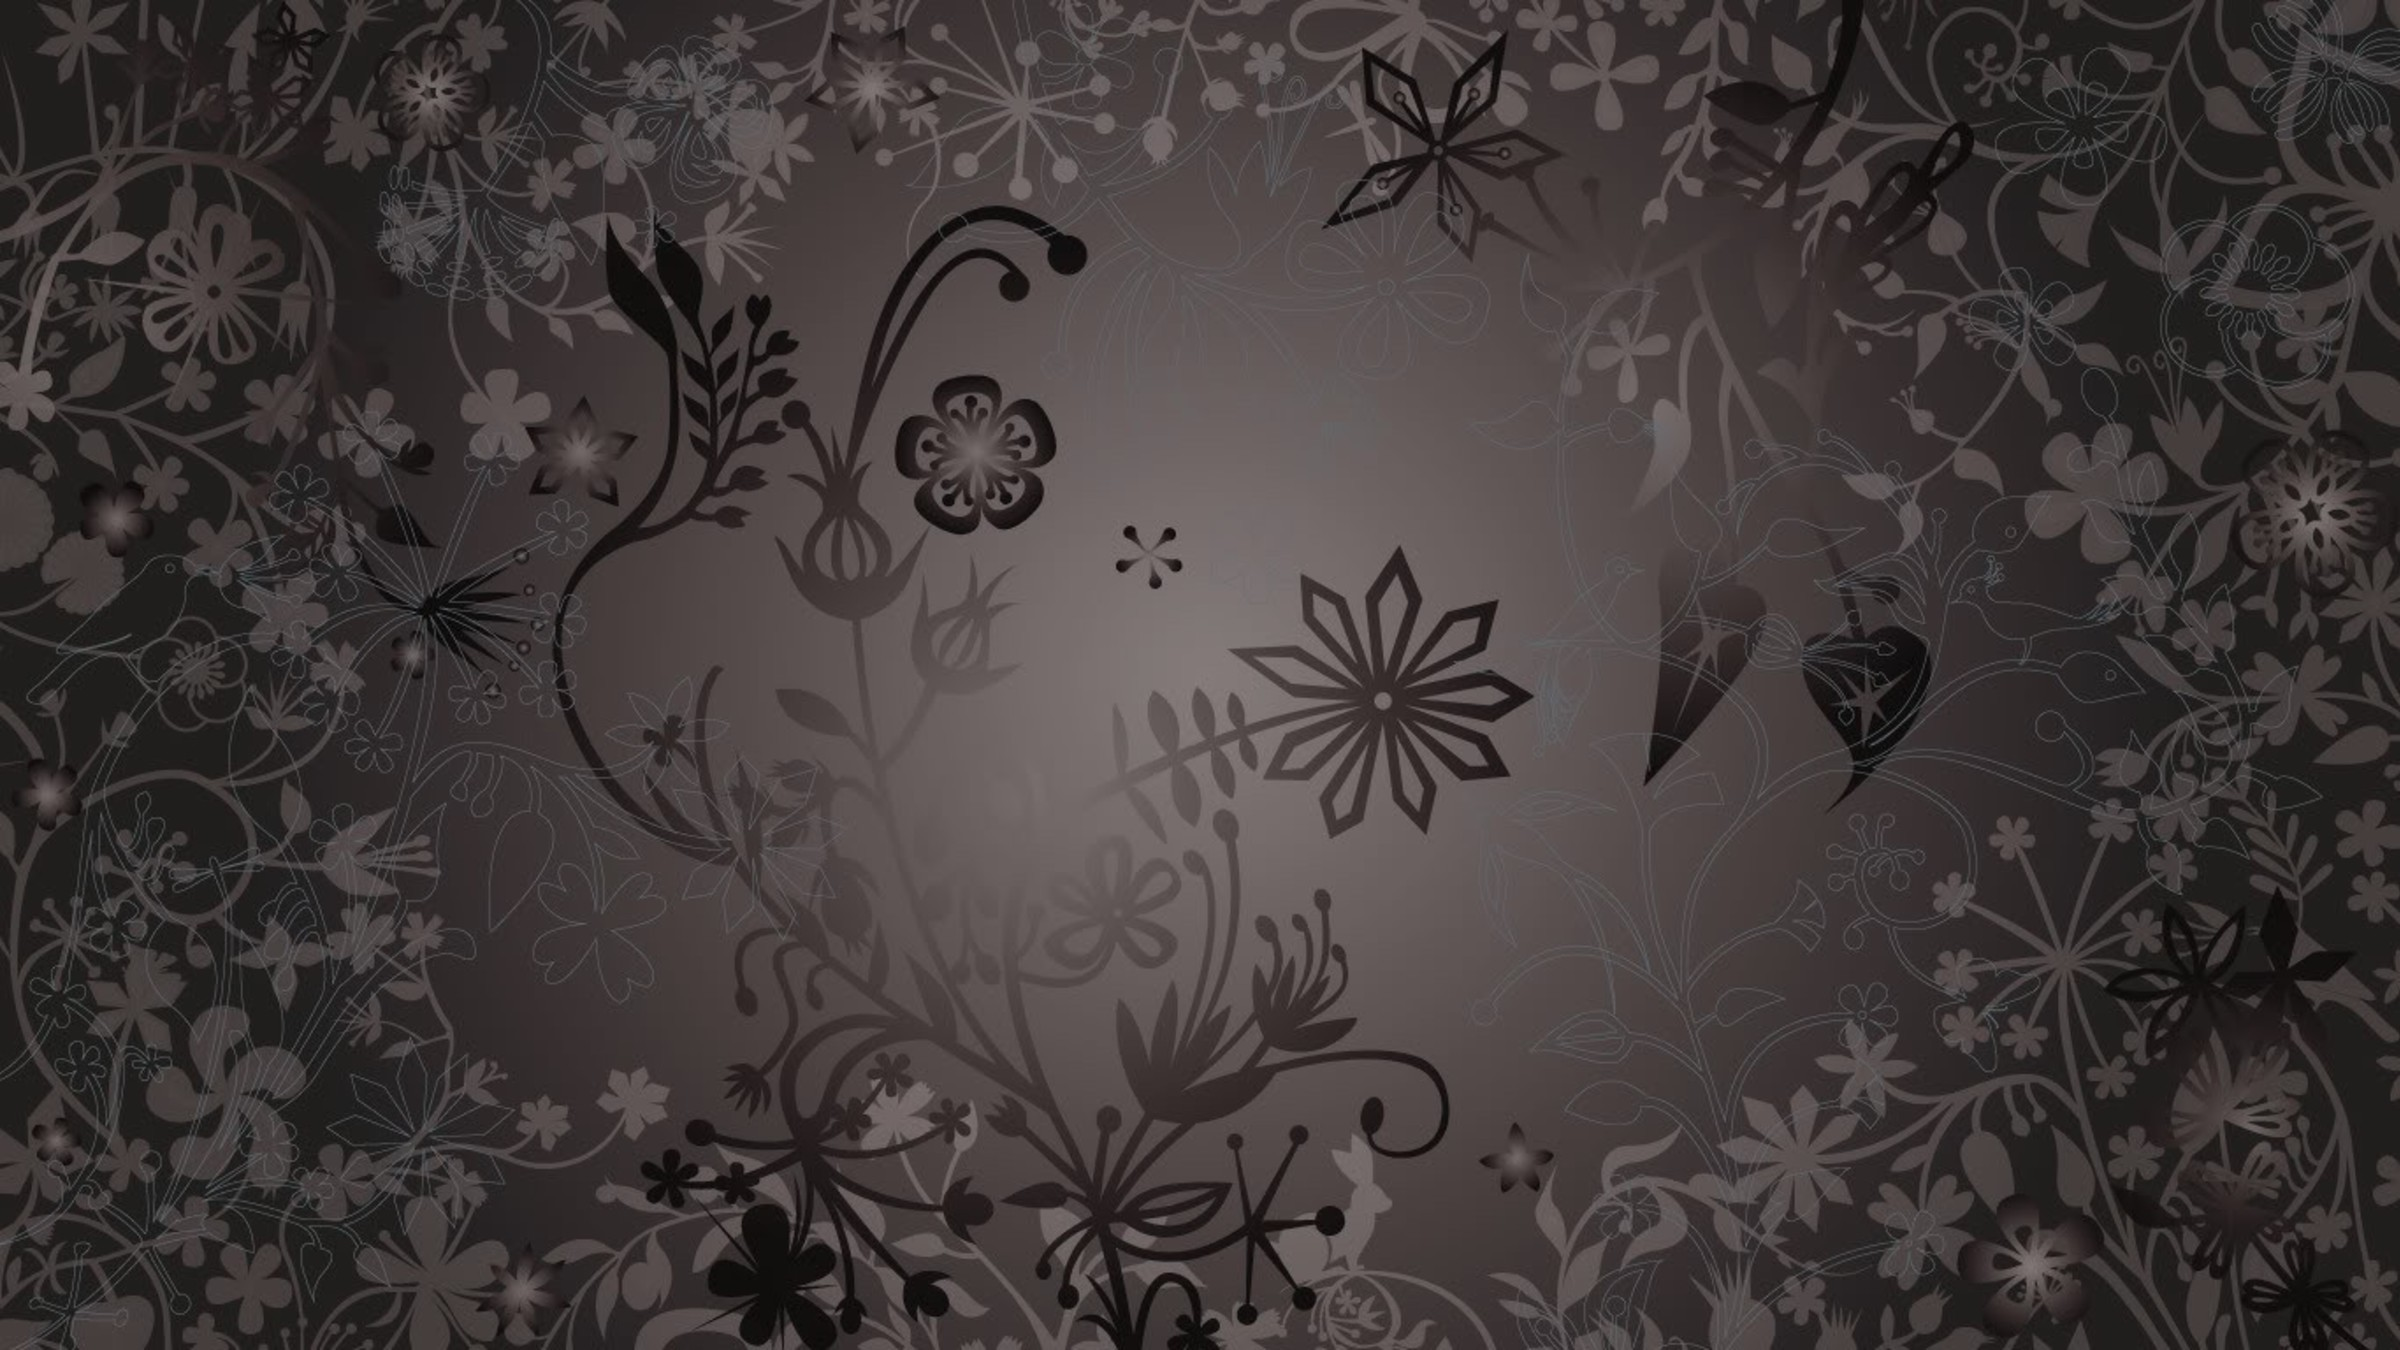 wallpaper.wiki-Black-Lenovo-Thinkpad-Wallpaper-PIC-WPD001984